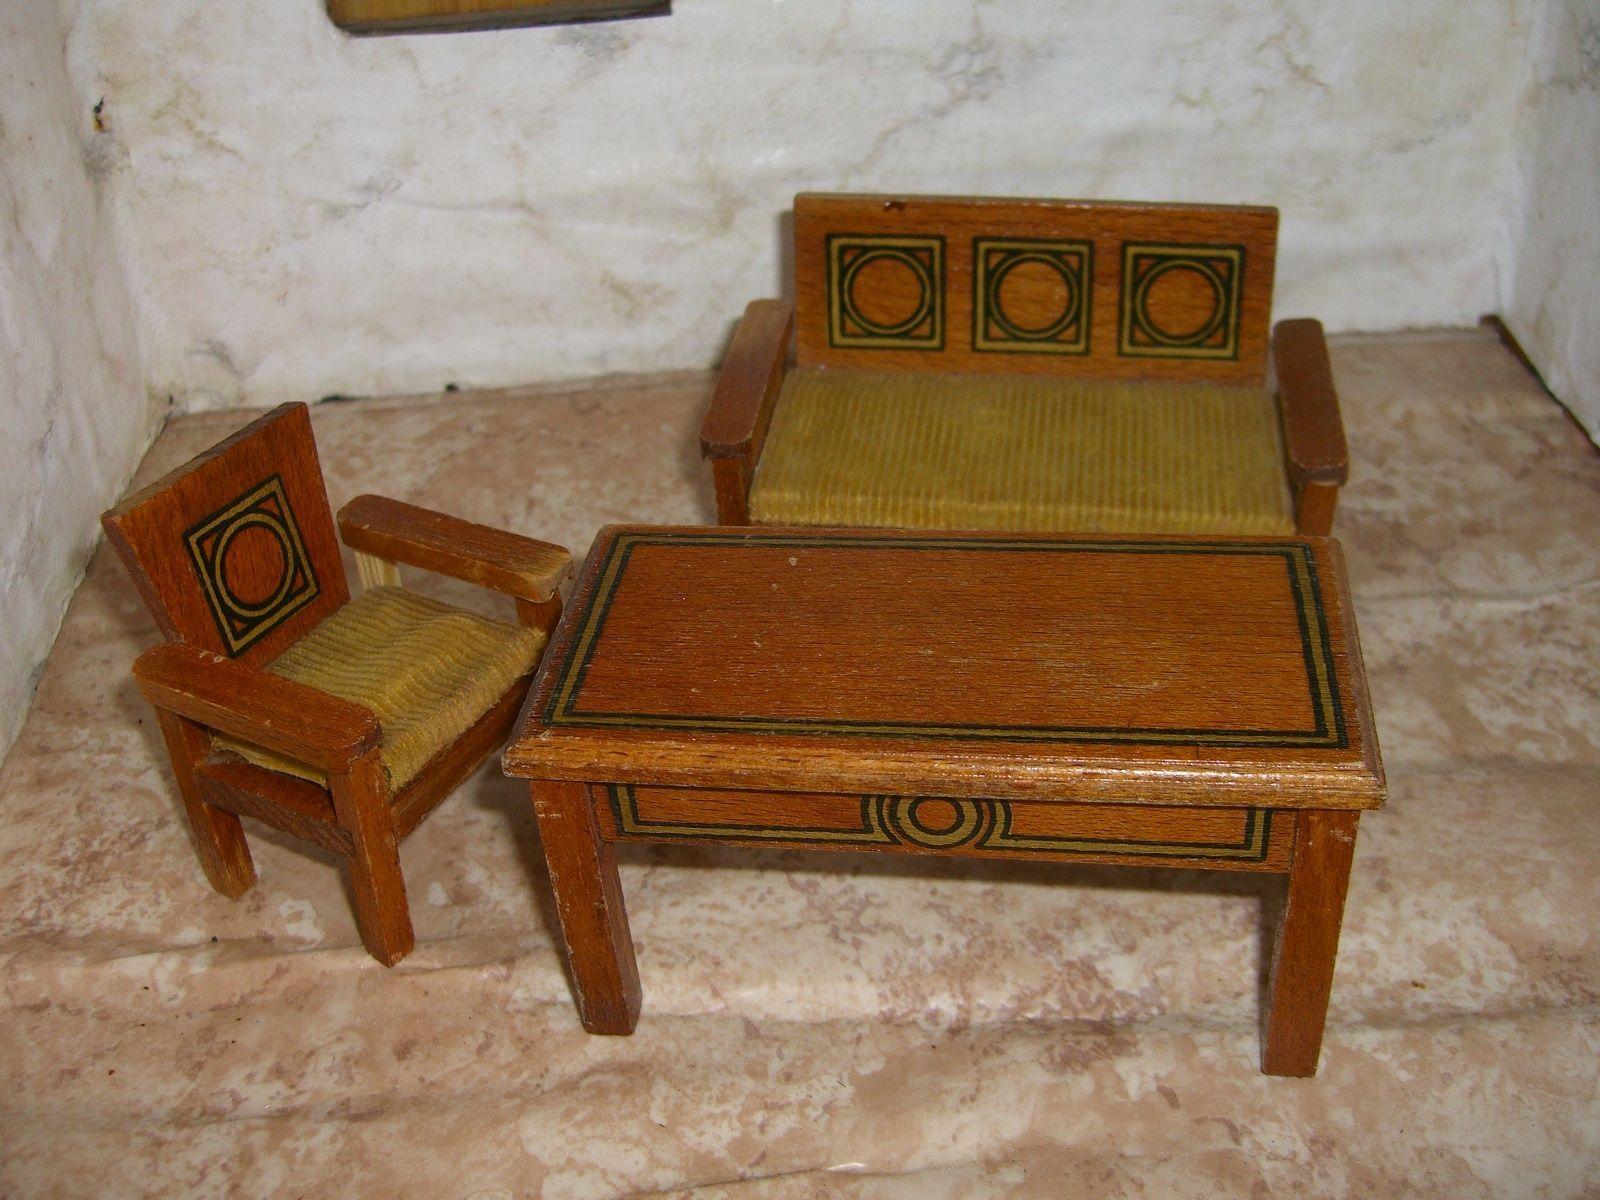 puppenstubenm bel m bel f r die puppenstube sehr alte sitzgruppe ebay dollhouse. Black Bedroom Furniture Sets. Home Design Ideas